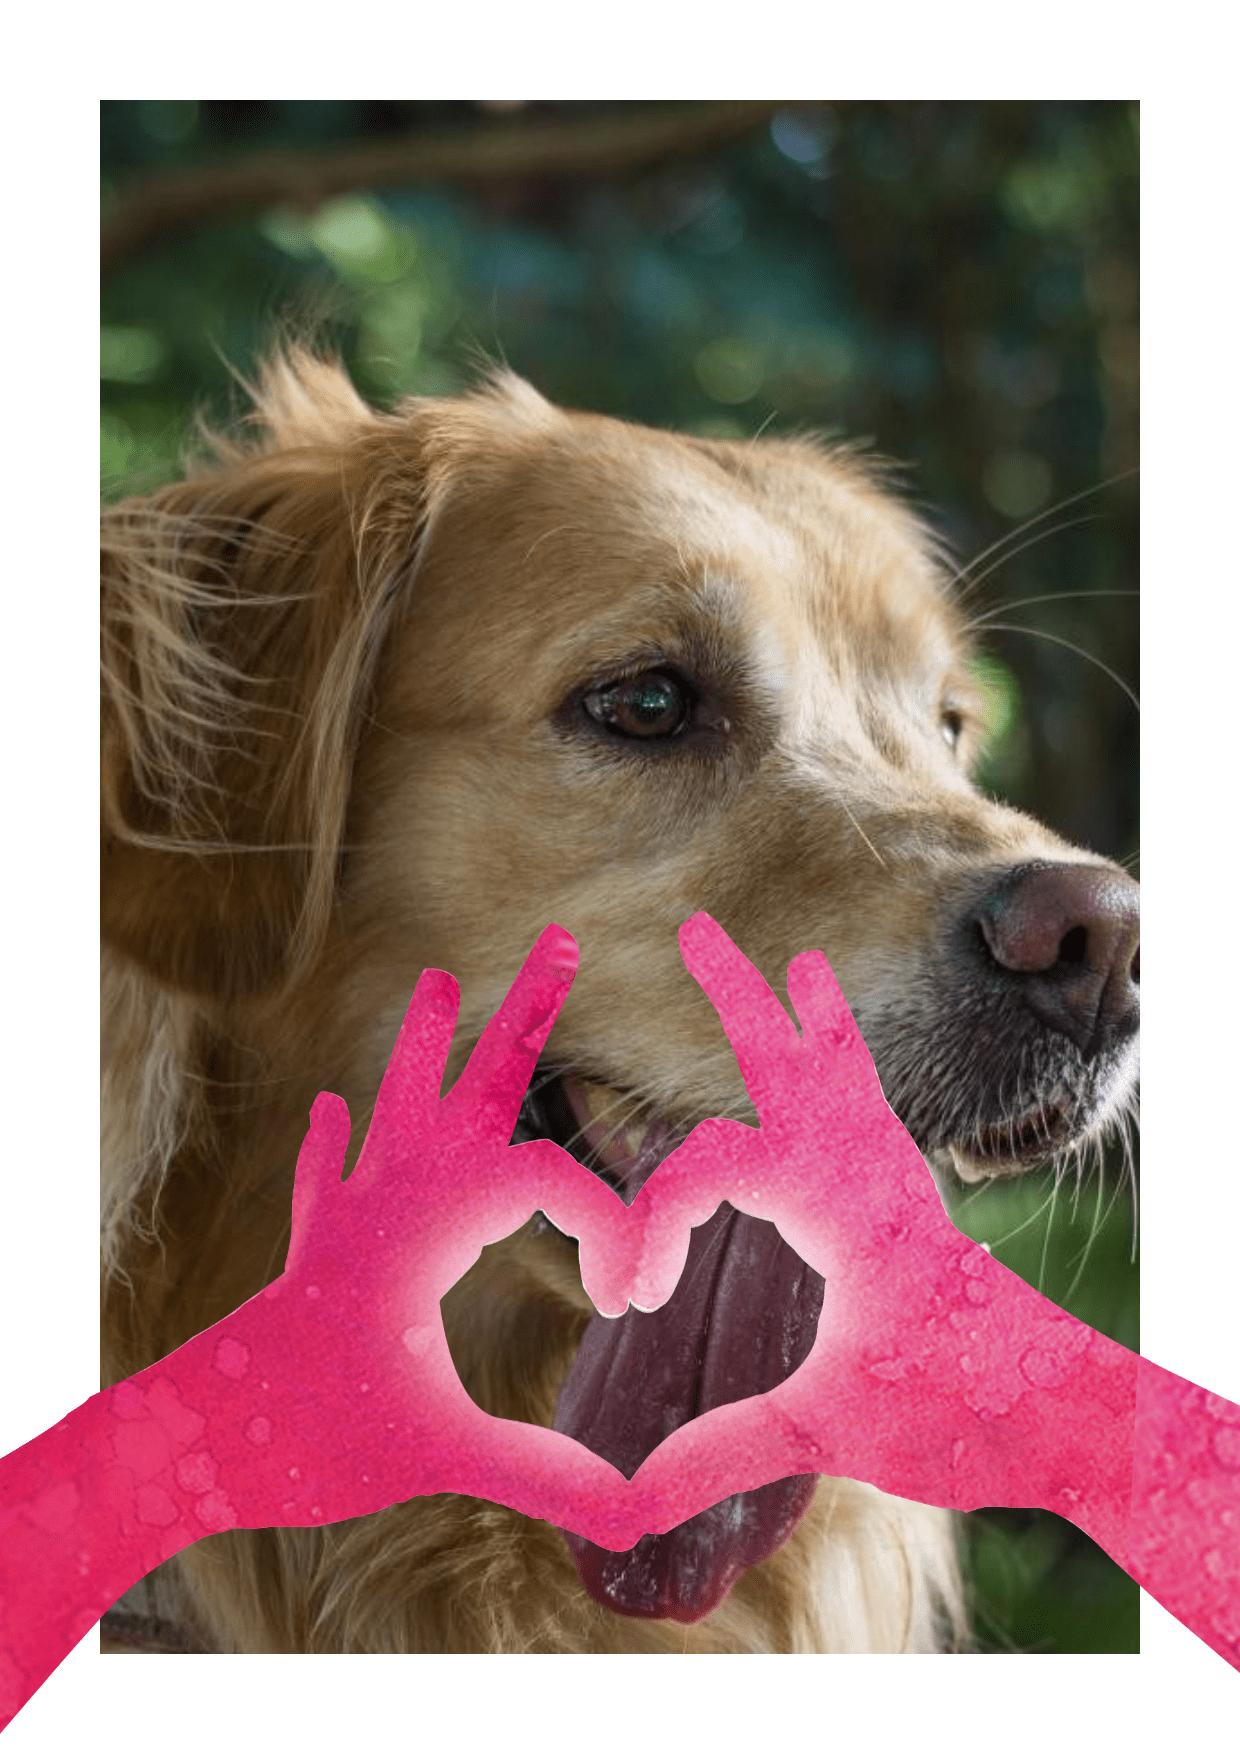 Dog,                Mammal,                Vertebrate,                Breed,                Nose,                Image,                Avatar,                Love,                White,                Black,                Red,                 Free Image